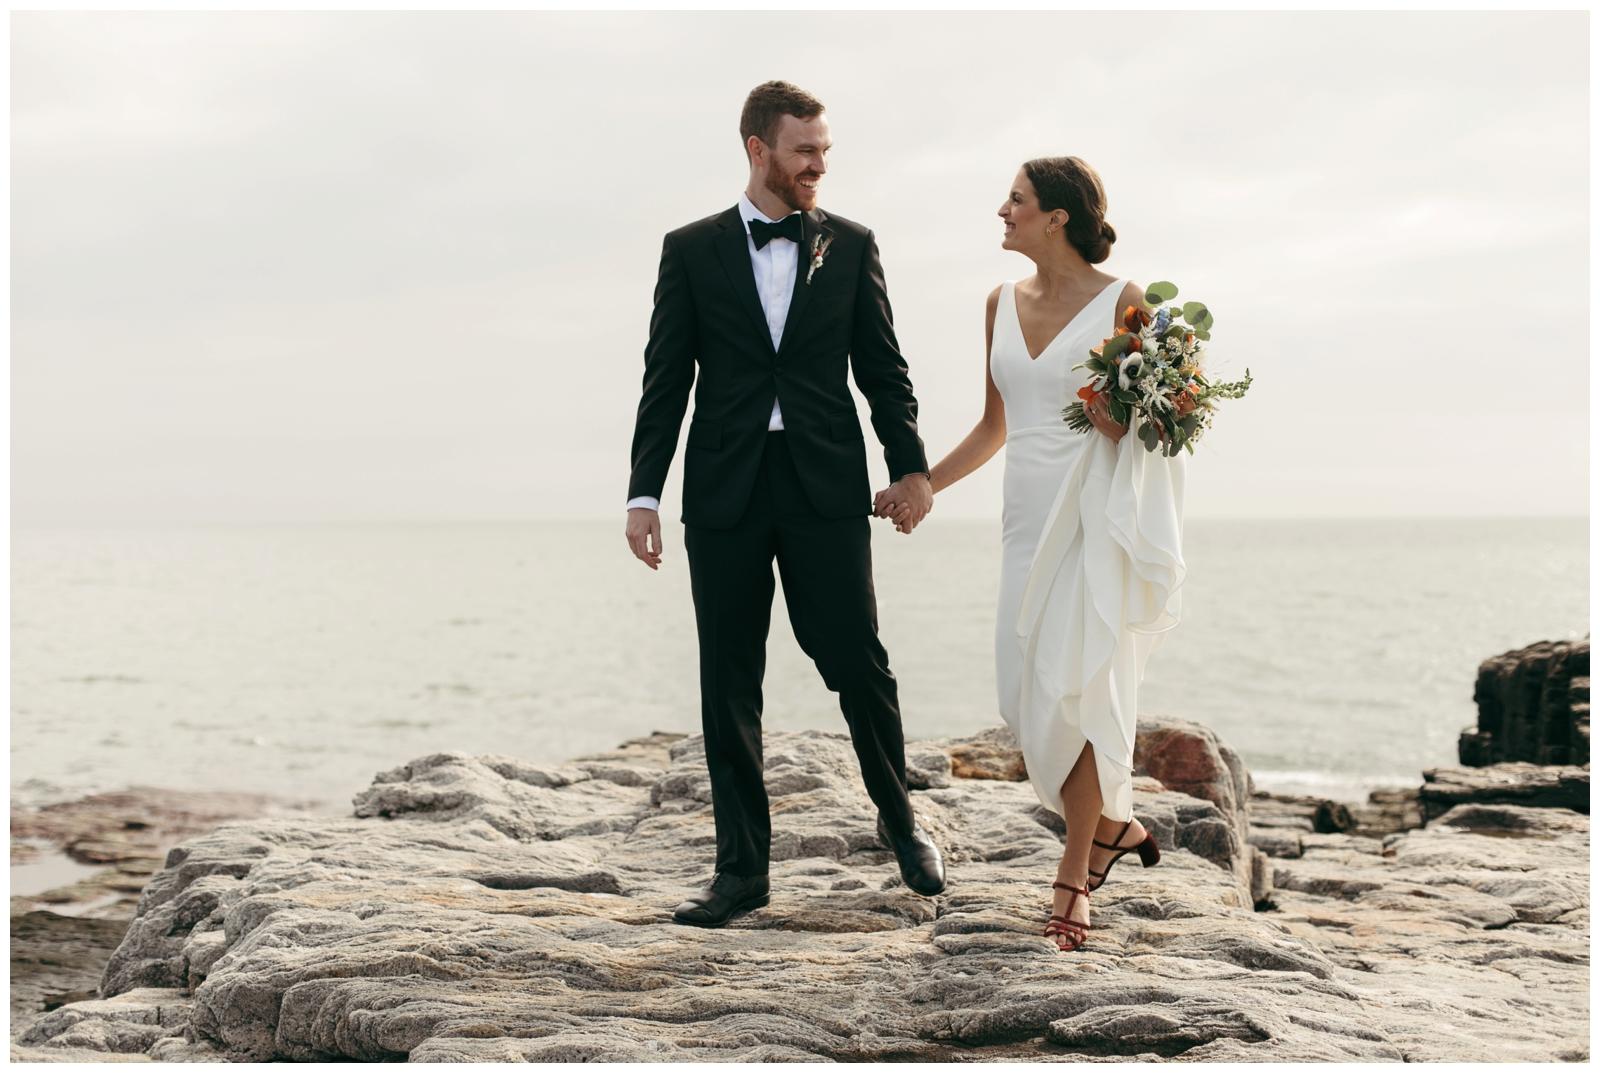 Madison-Beach-Hotel-Wedding-Bailey-Q-Photo-Boston-Wedding-Photographer-020.jpg